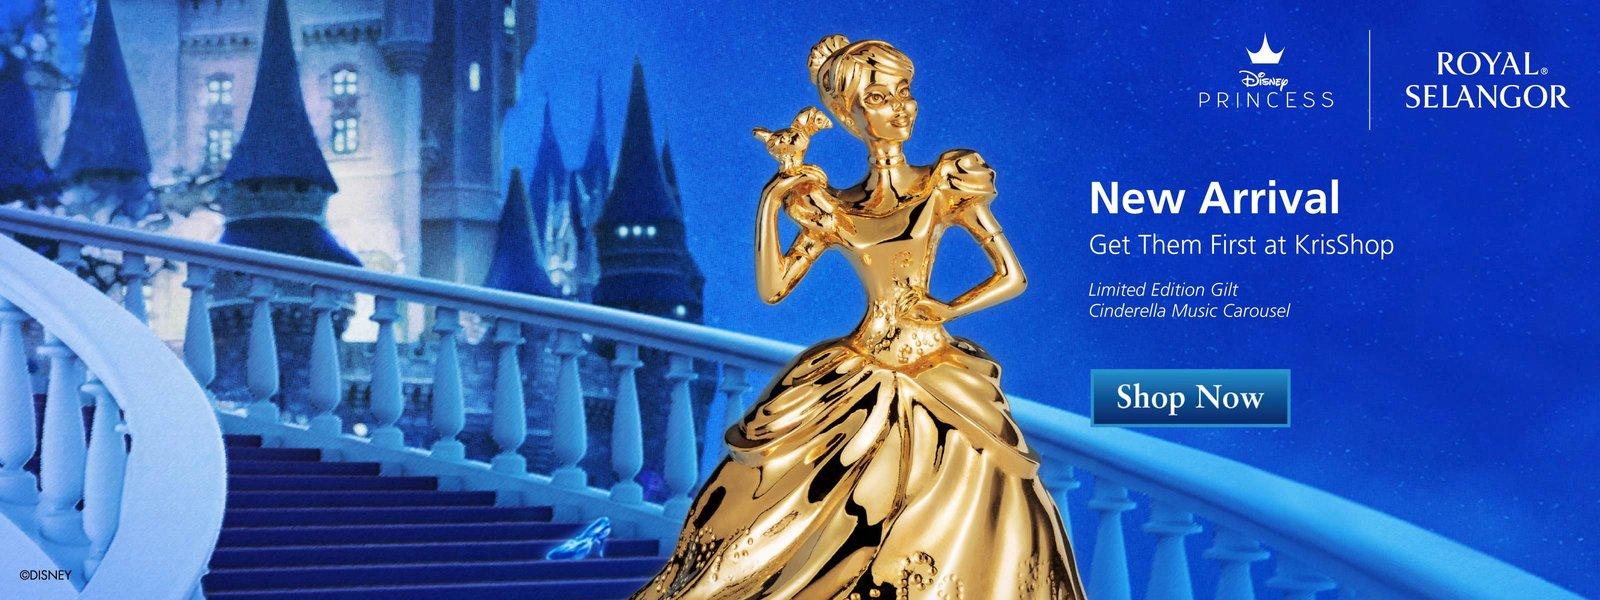 Royal Selangor - Limited Edition Cinderella Music Carousel